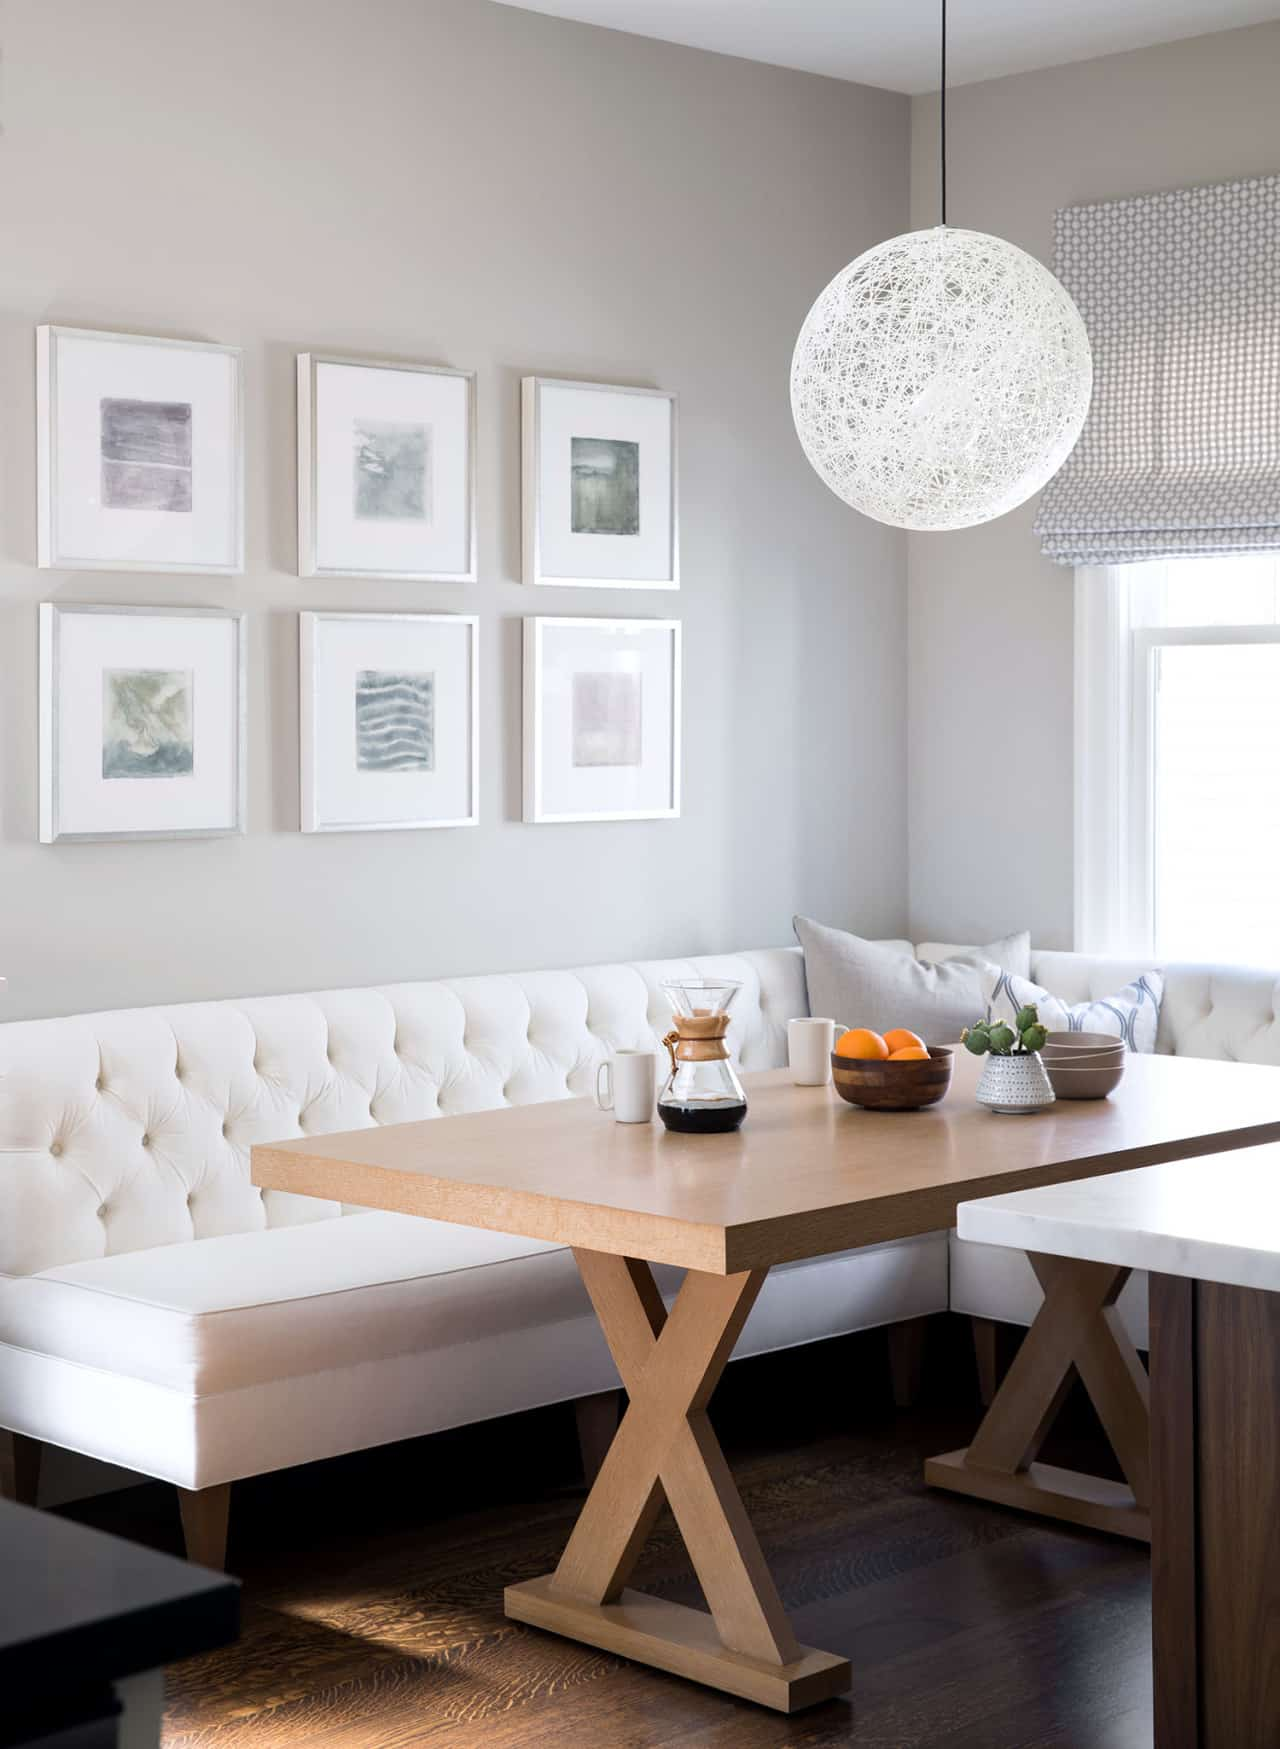 Elegant breakfast area